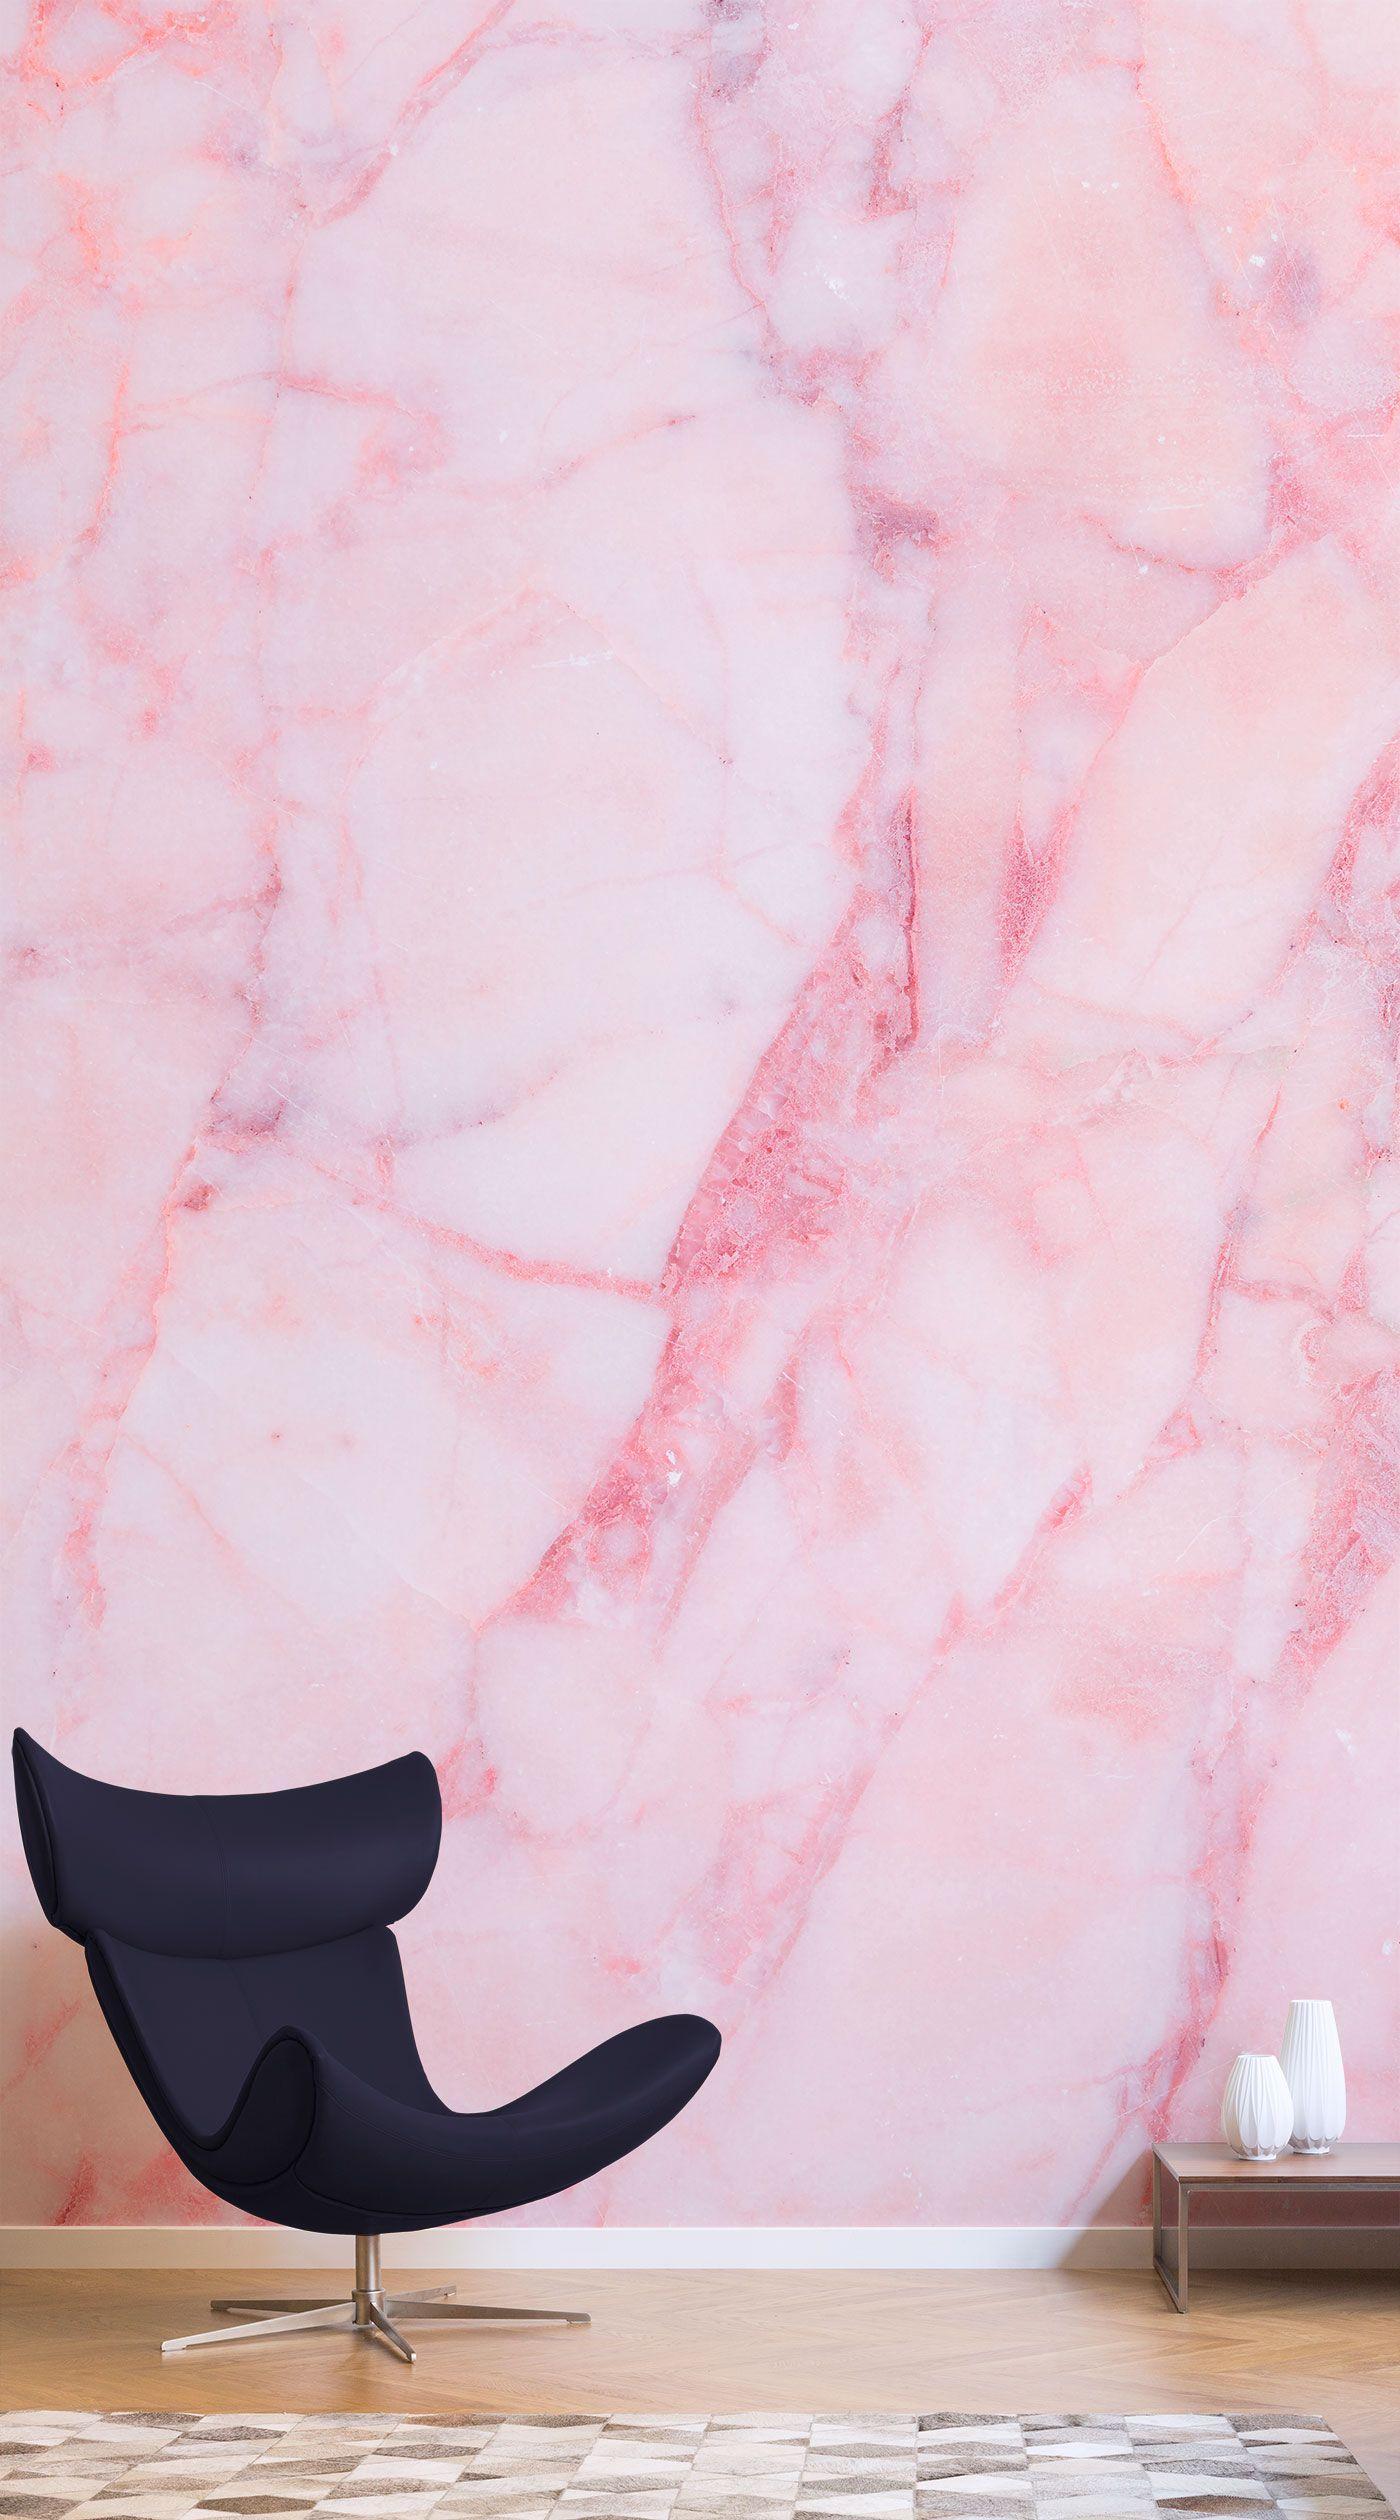 Baby Pink Cracked Marble Wallpaper Mural MuralsWallpaper